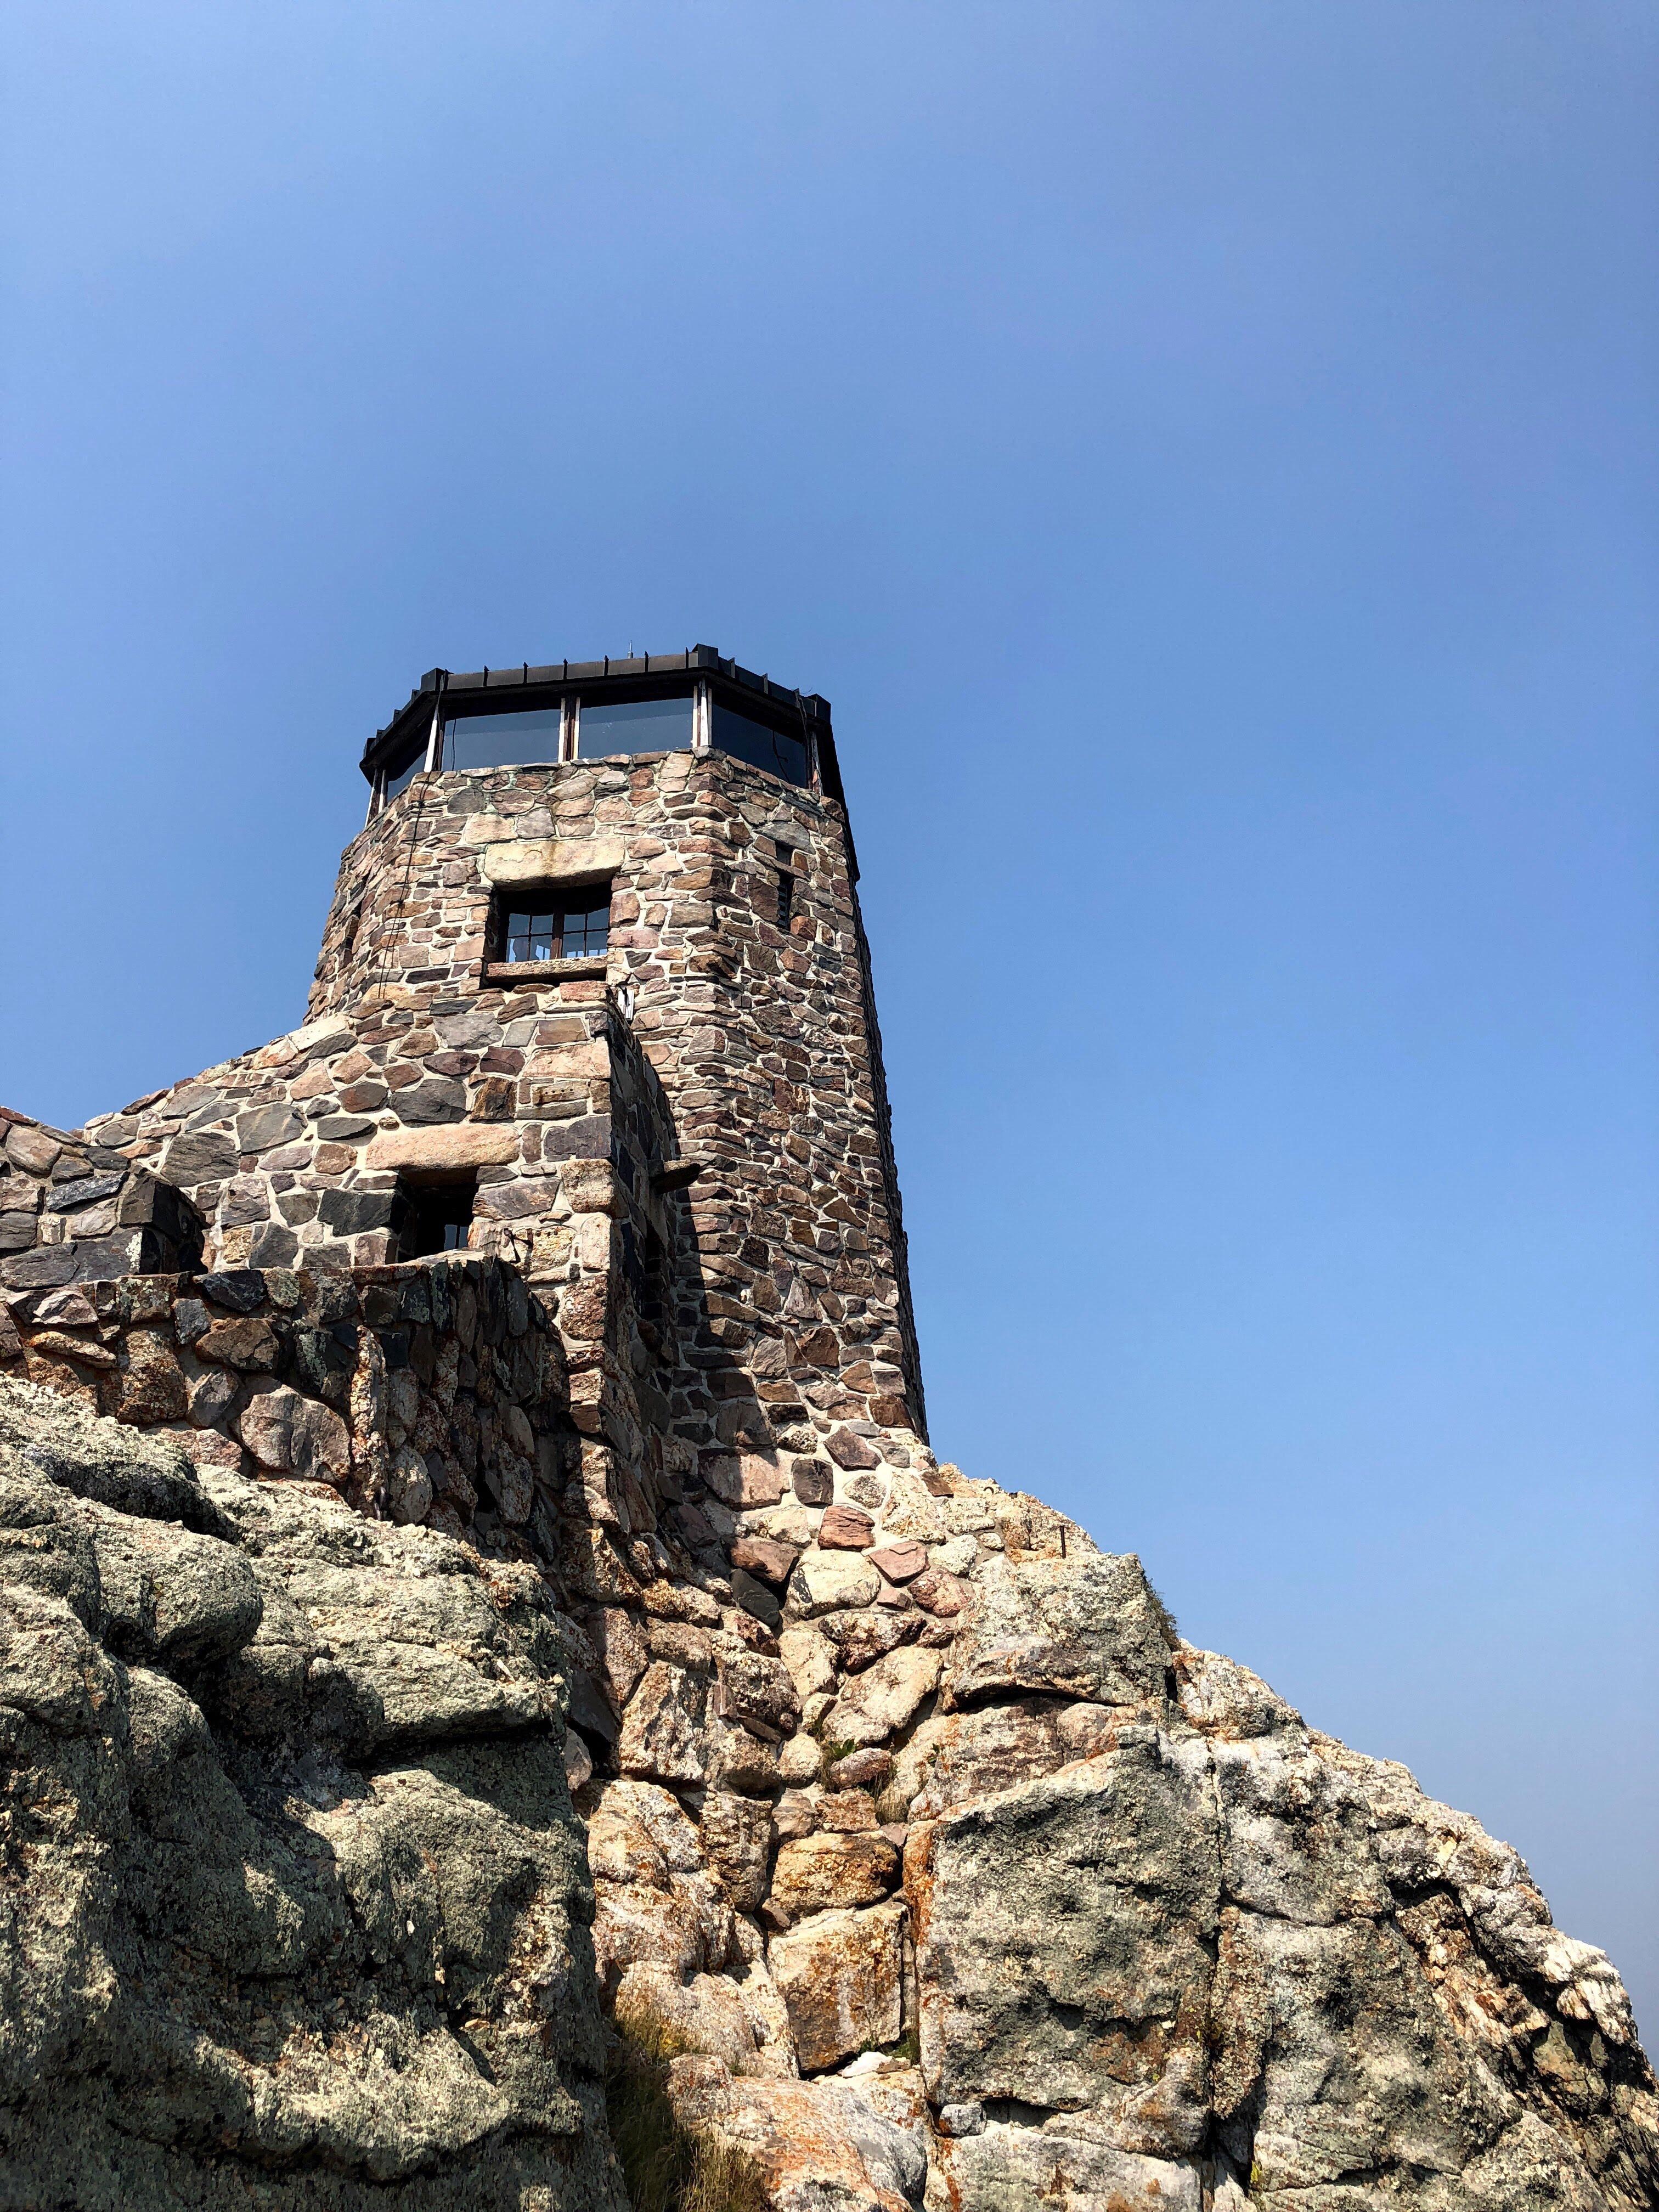 Harney Peak Lookout Tower from below